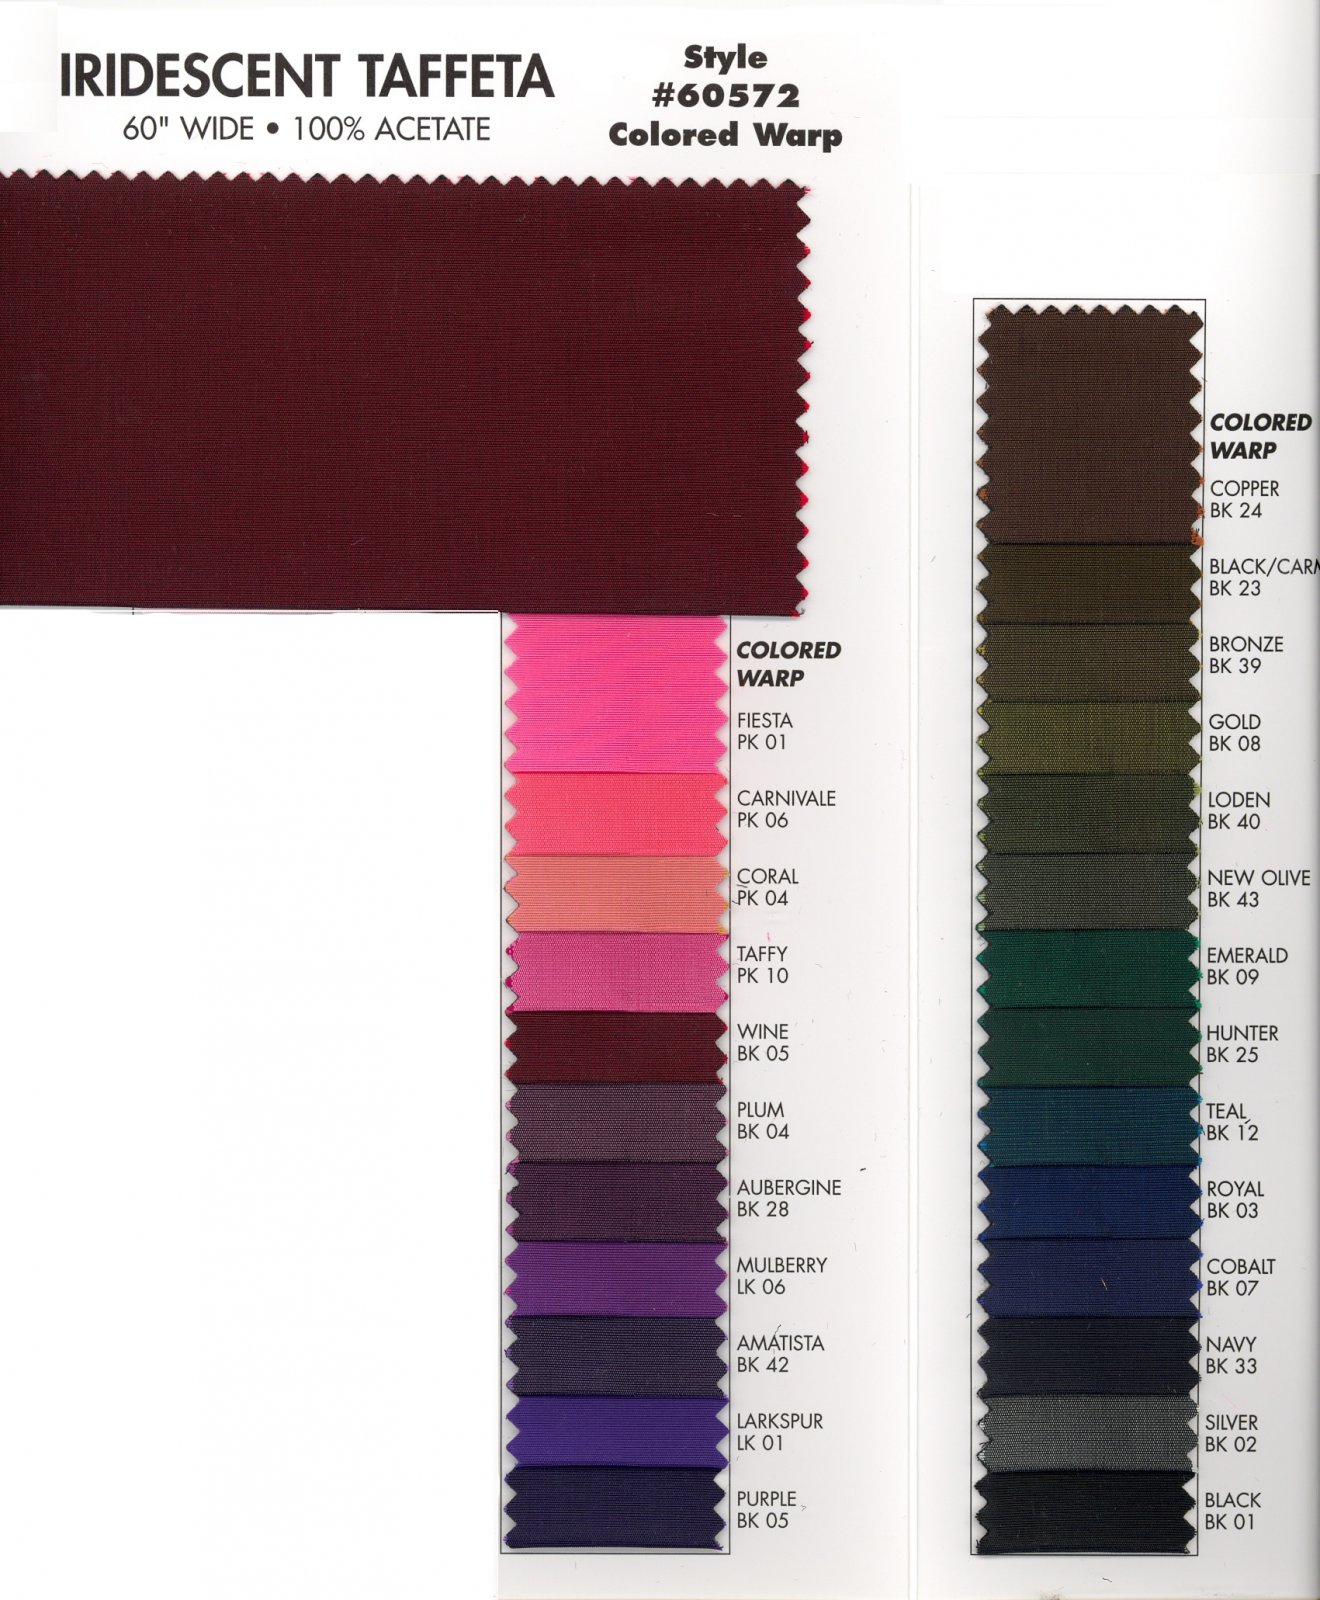 Iridescent Taffeta Colored Warp  Style # 60572